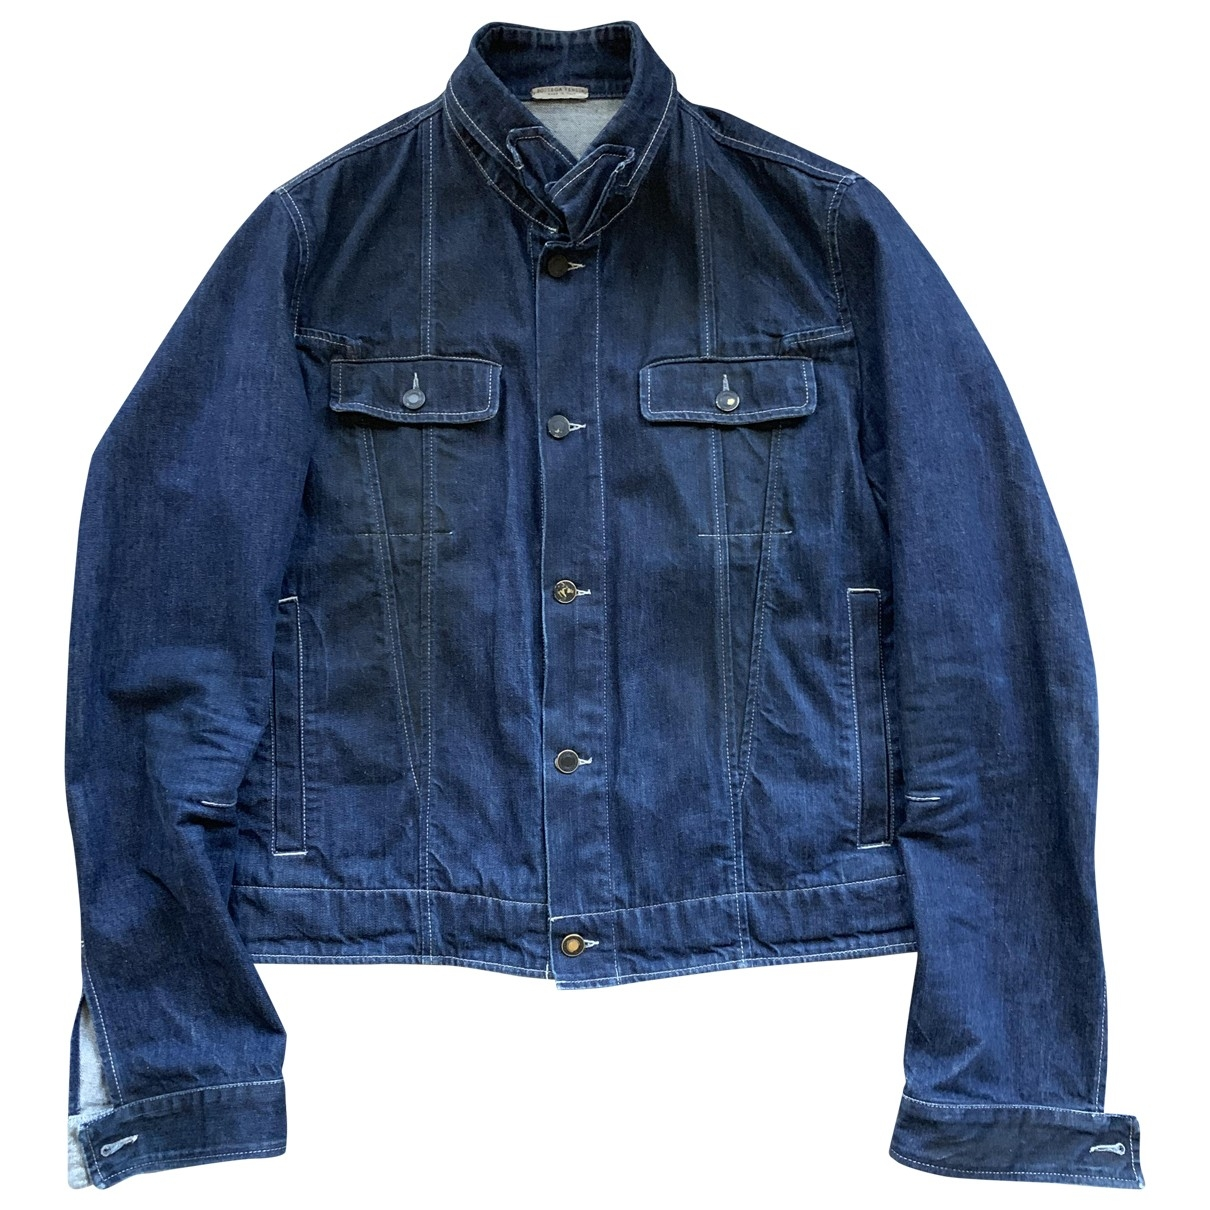 Bottega Veneta \N Jacke in  Blau Denim - Jeans